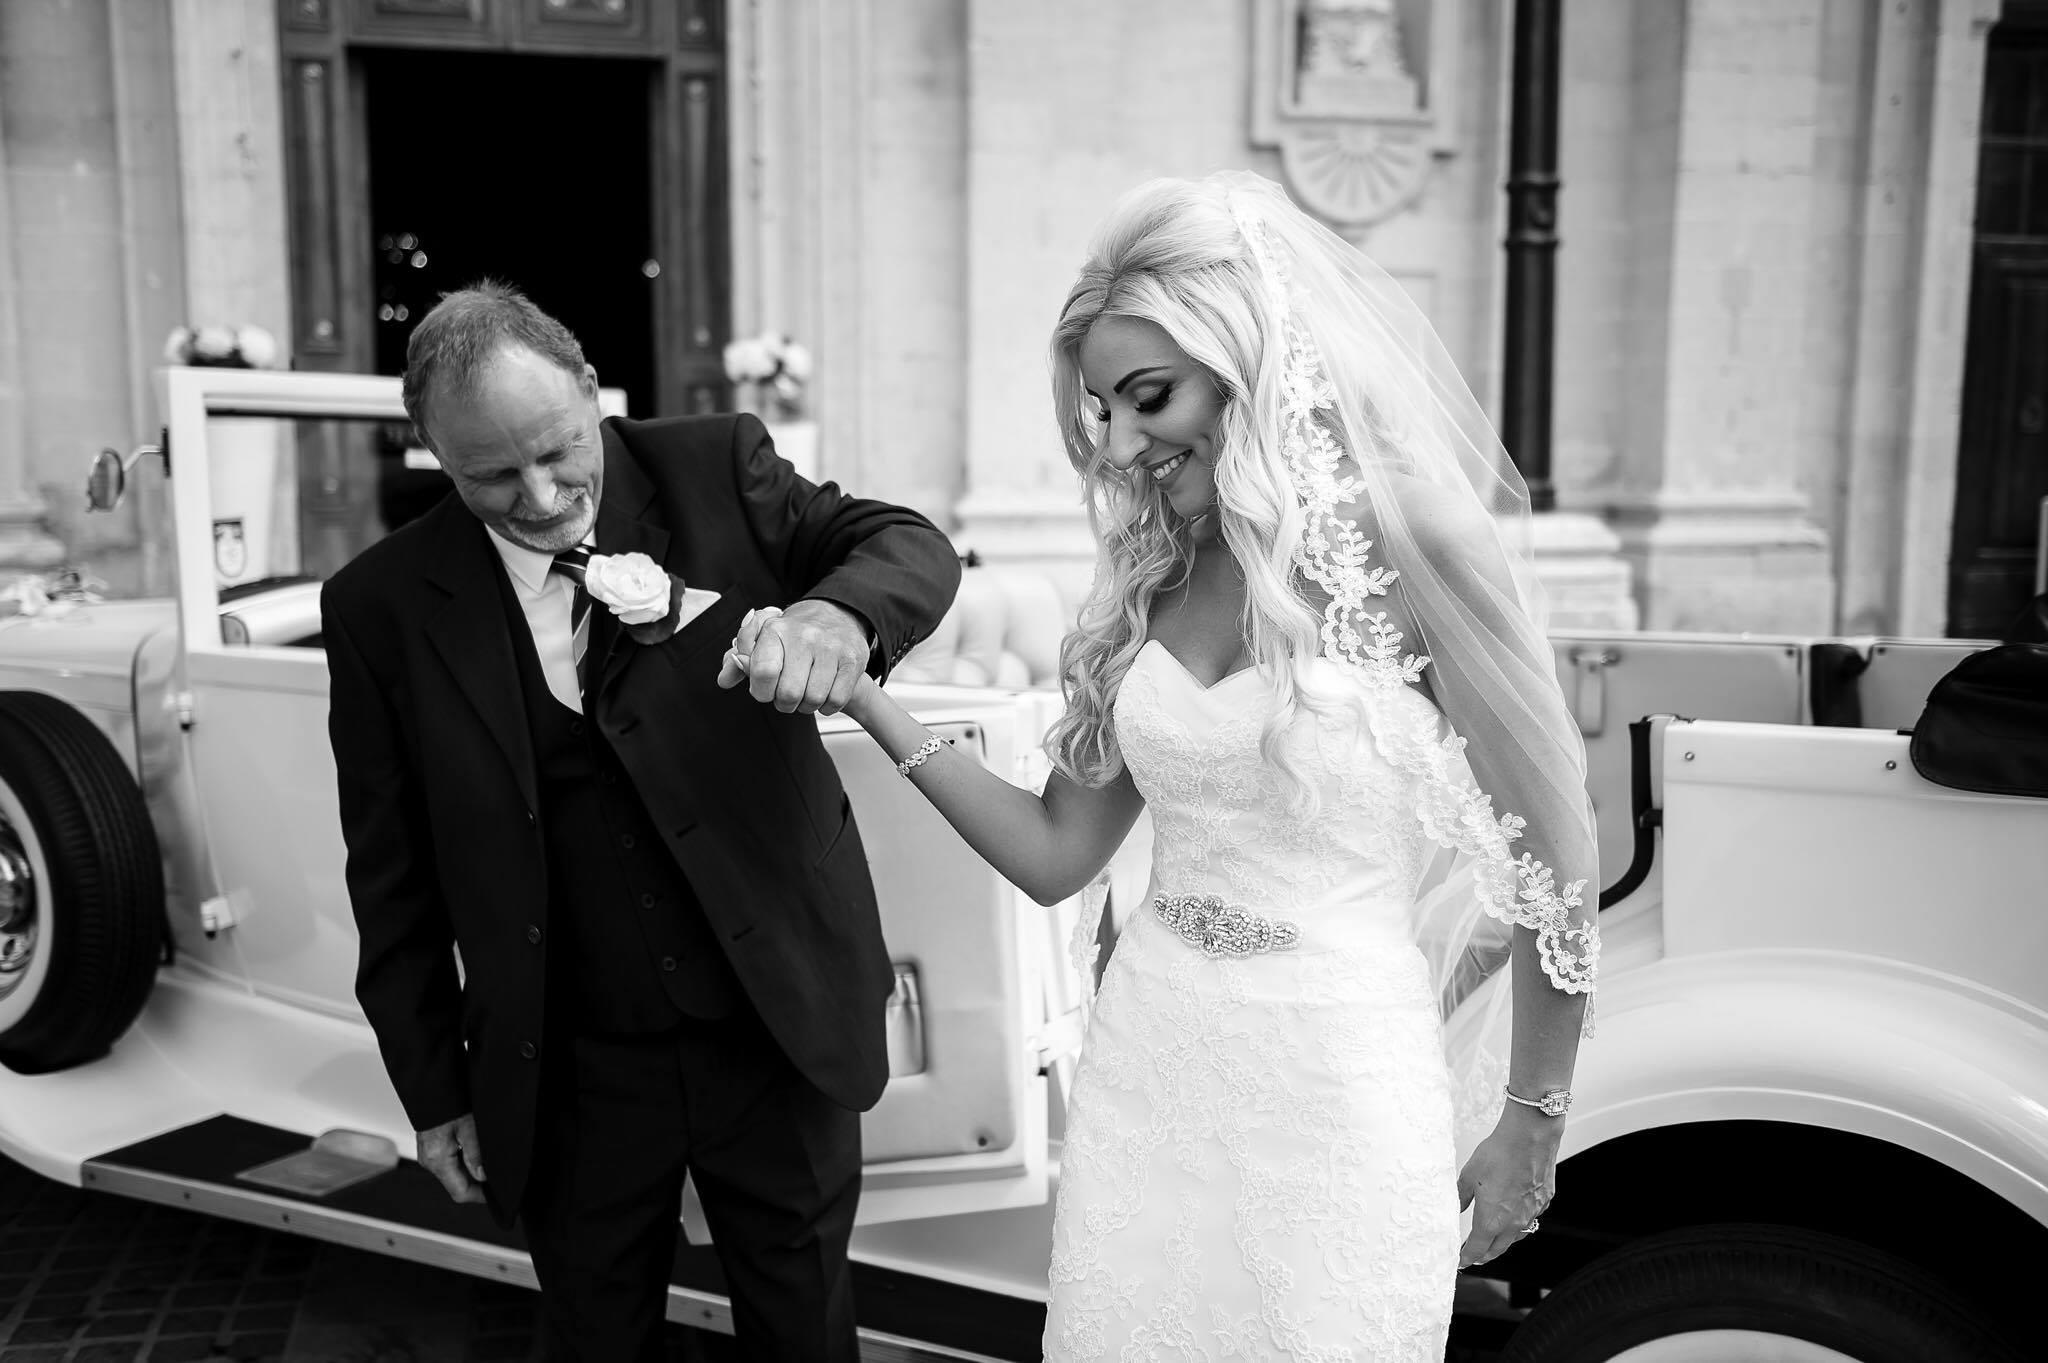 Real Bride Marelda wears a custom lace waterfall cut veil in chapel length